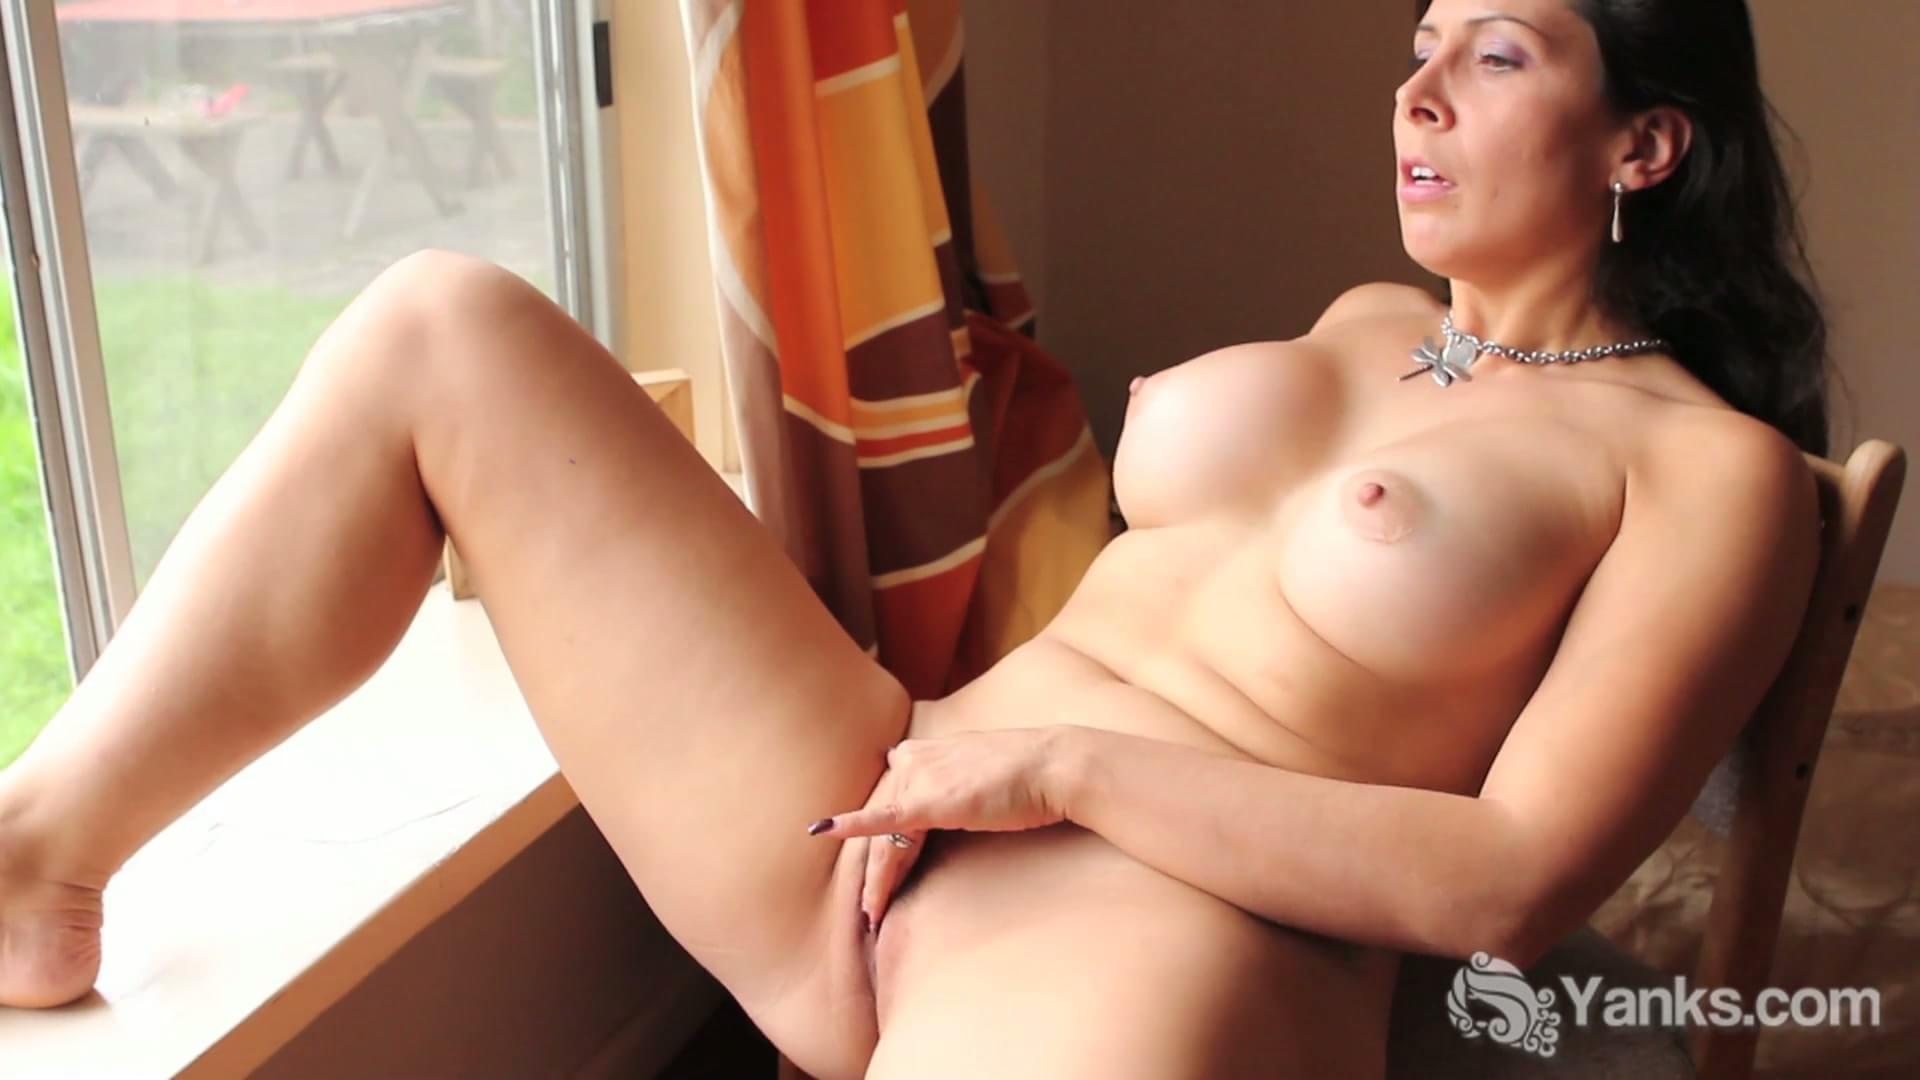 She masturbates with porn magazine and captured by neighbor german csm 3